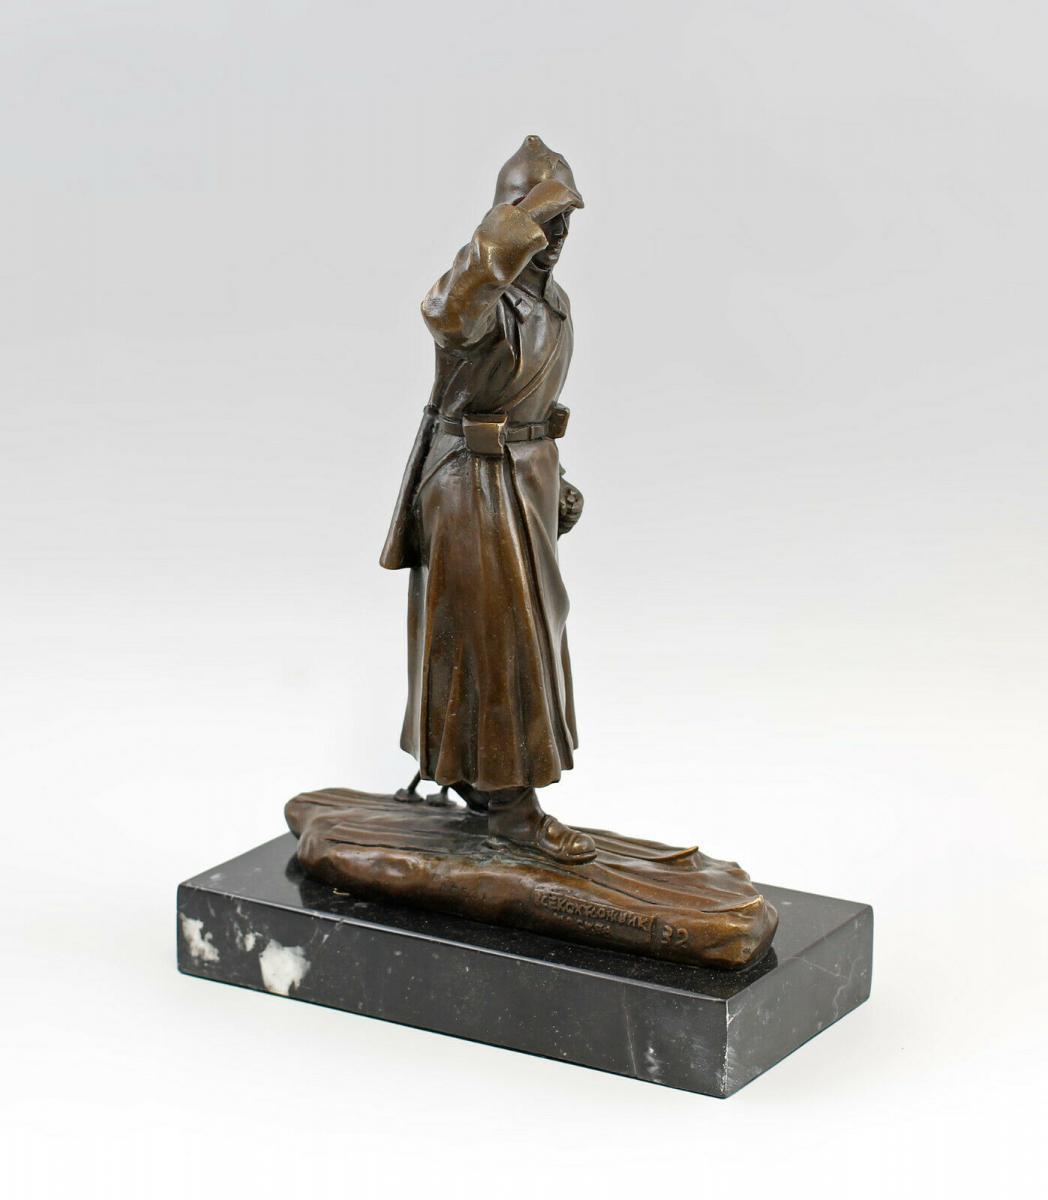 9937973-dss große Bronze Skulptur Figur Soldat auf Ski Rote Armee 0